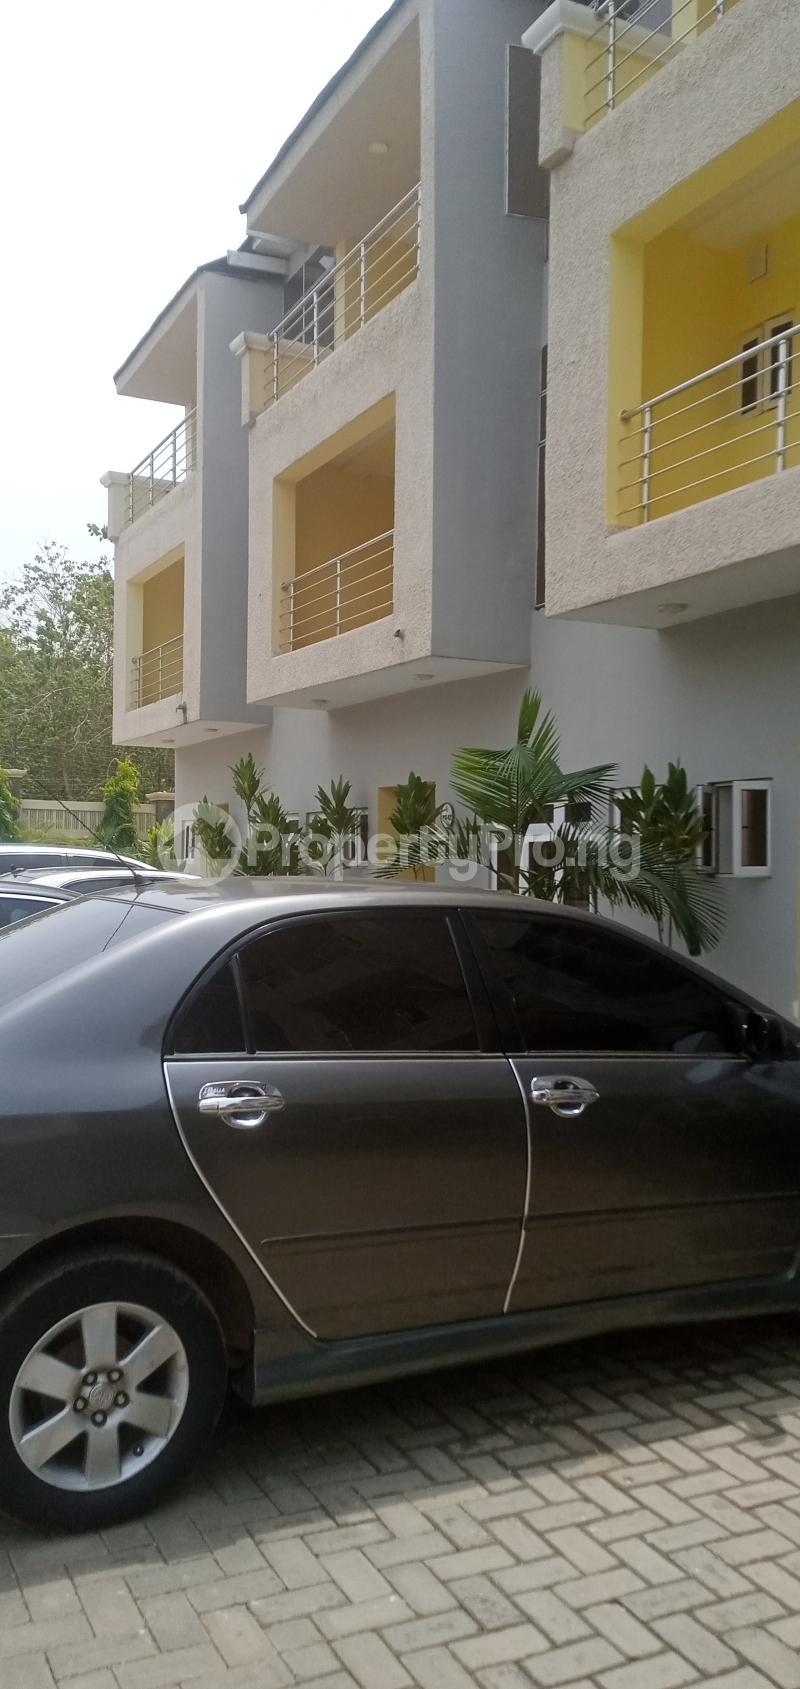 4 bedroom Terraced Duplex House for sale Close To Nnpc Guzape Guzape Abuja - 4